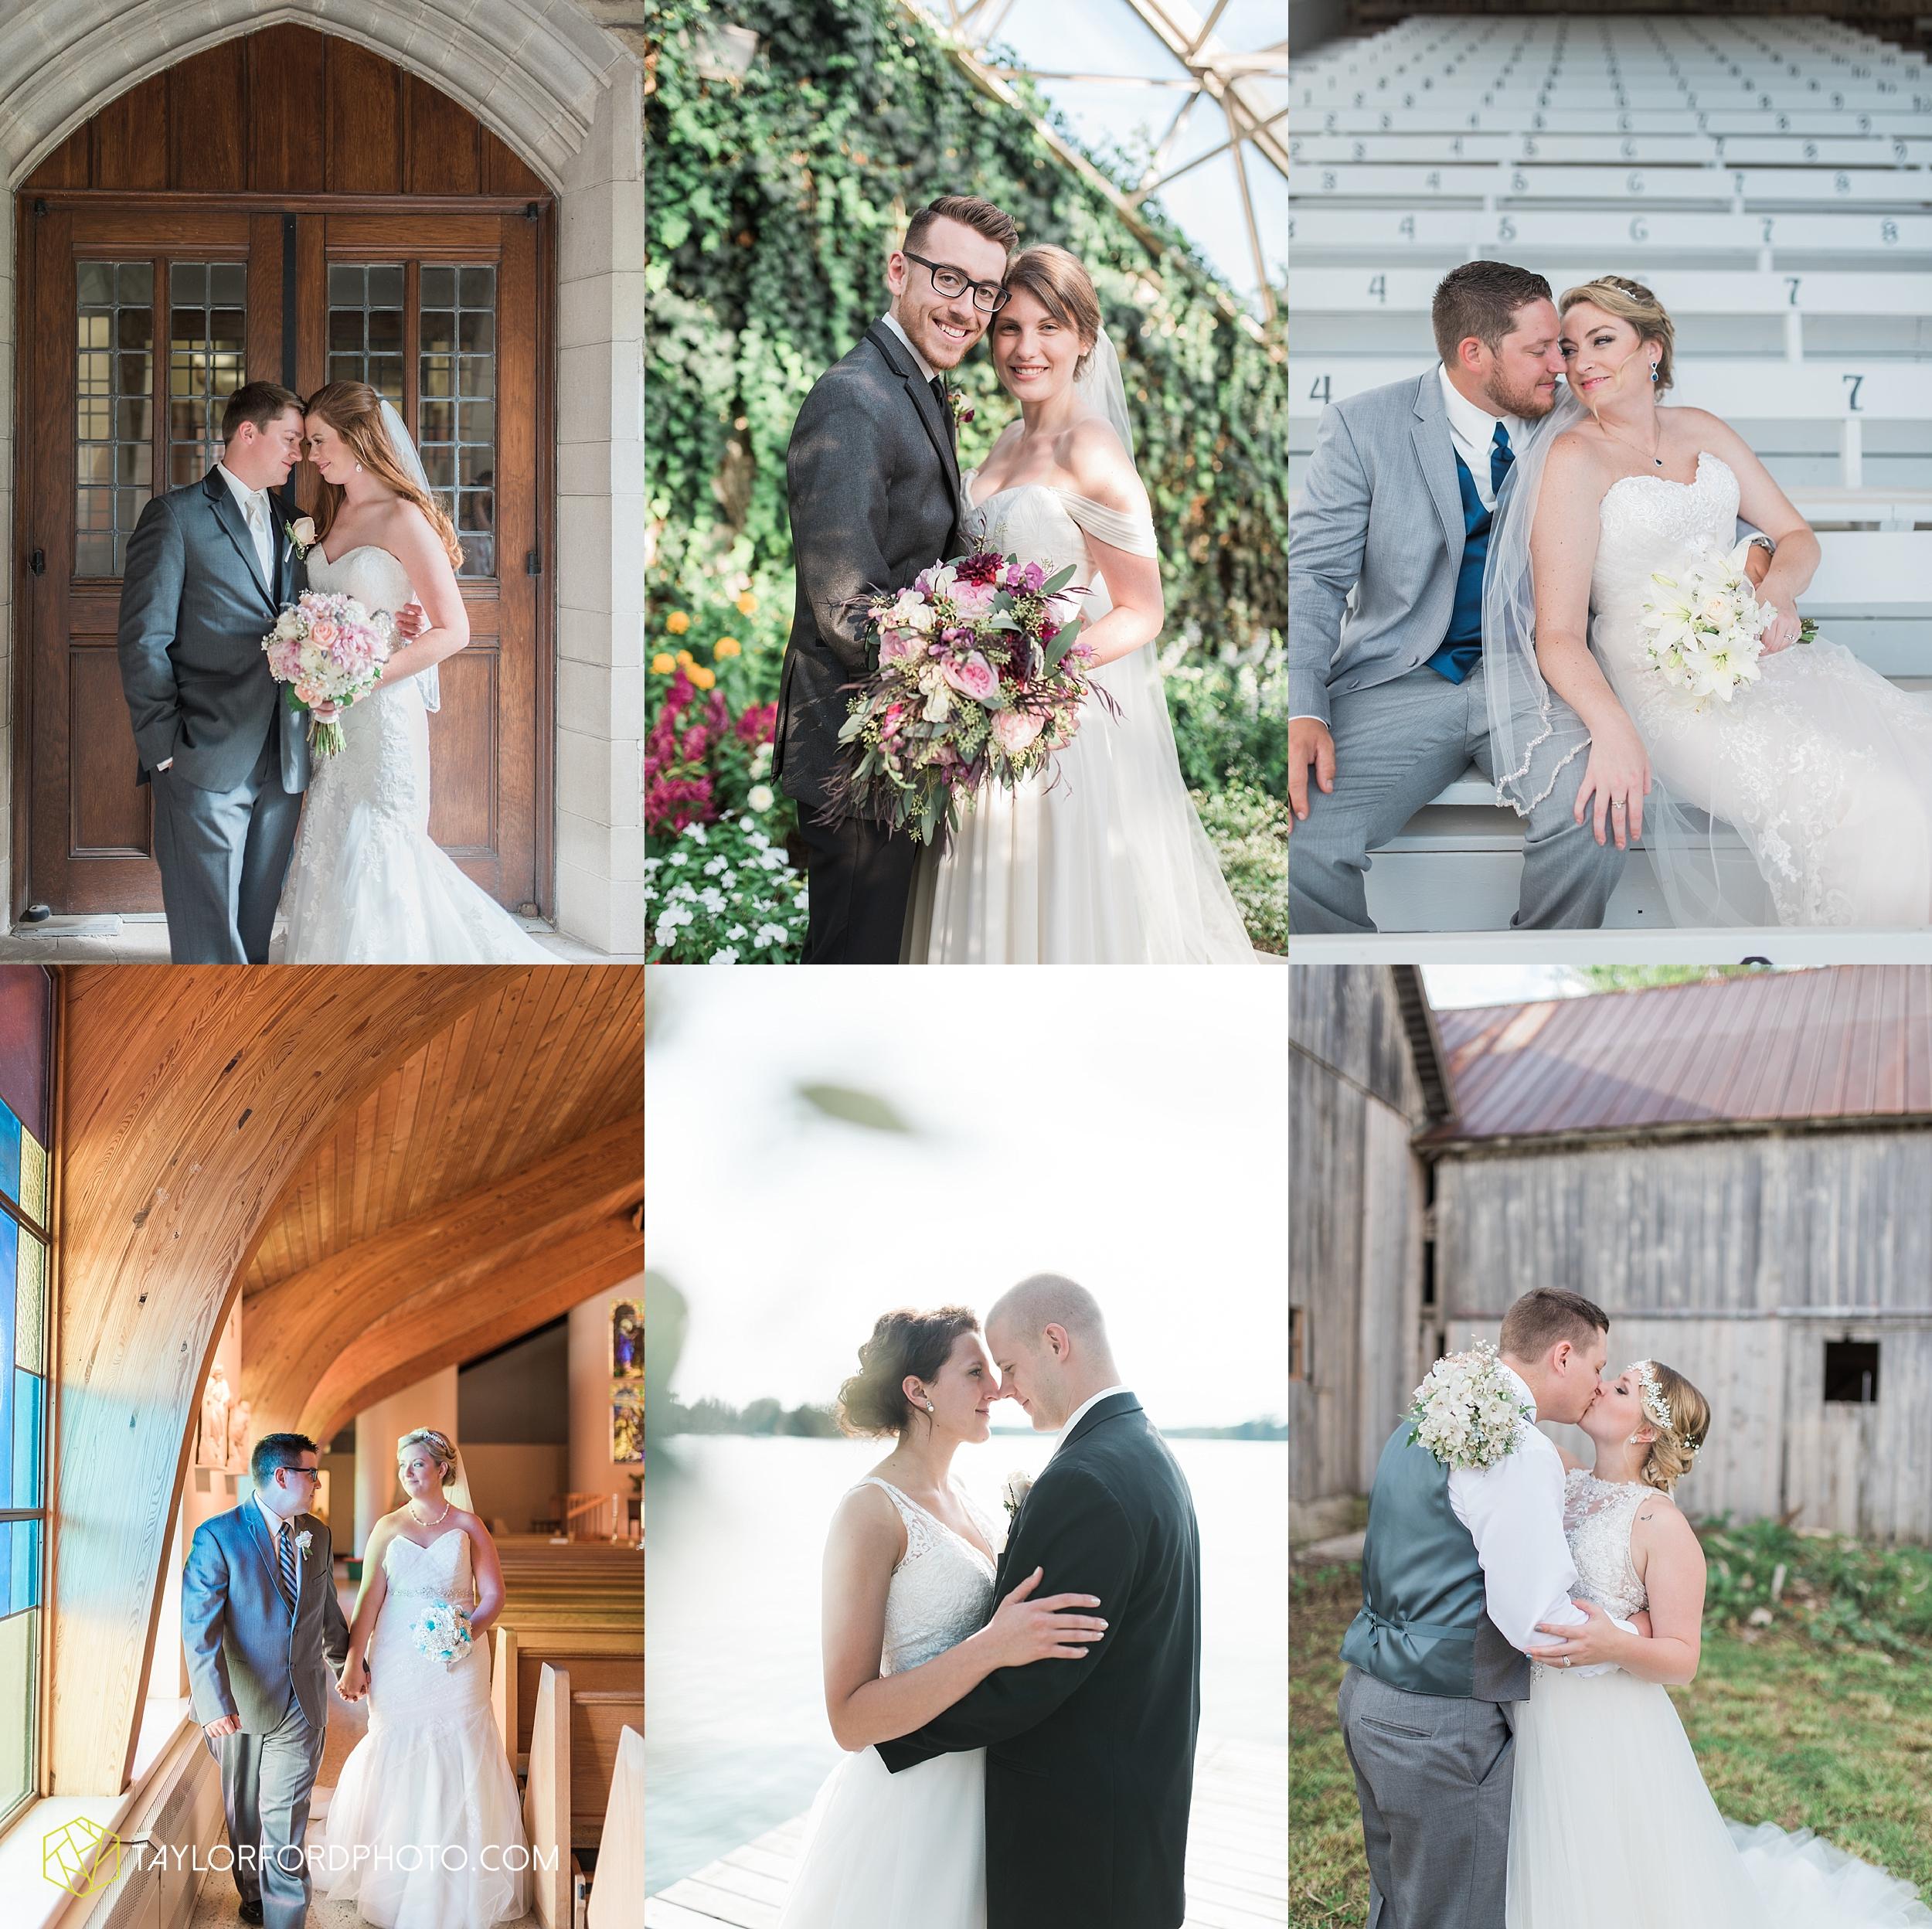 van-wert-ohio-fort-wayne-indiana-photographer-Taylor-Ford-Photography-wedding-engagement-family-senior_4410.jpg